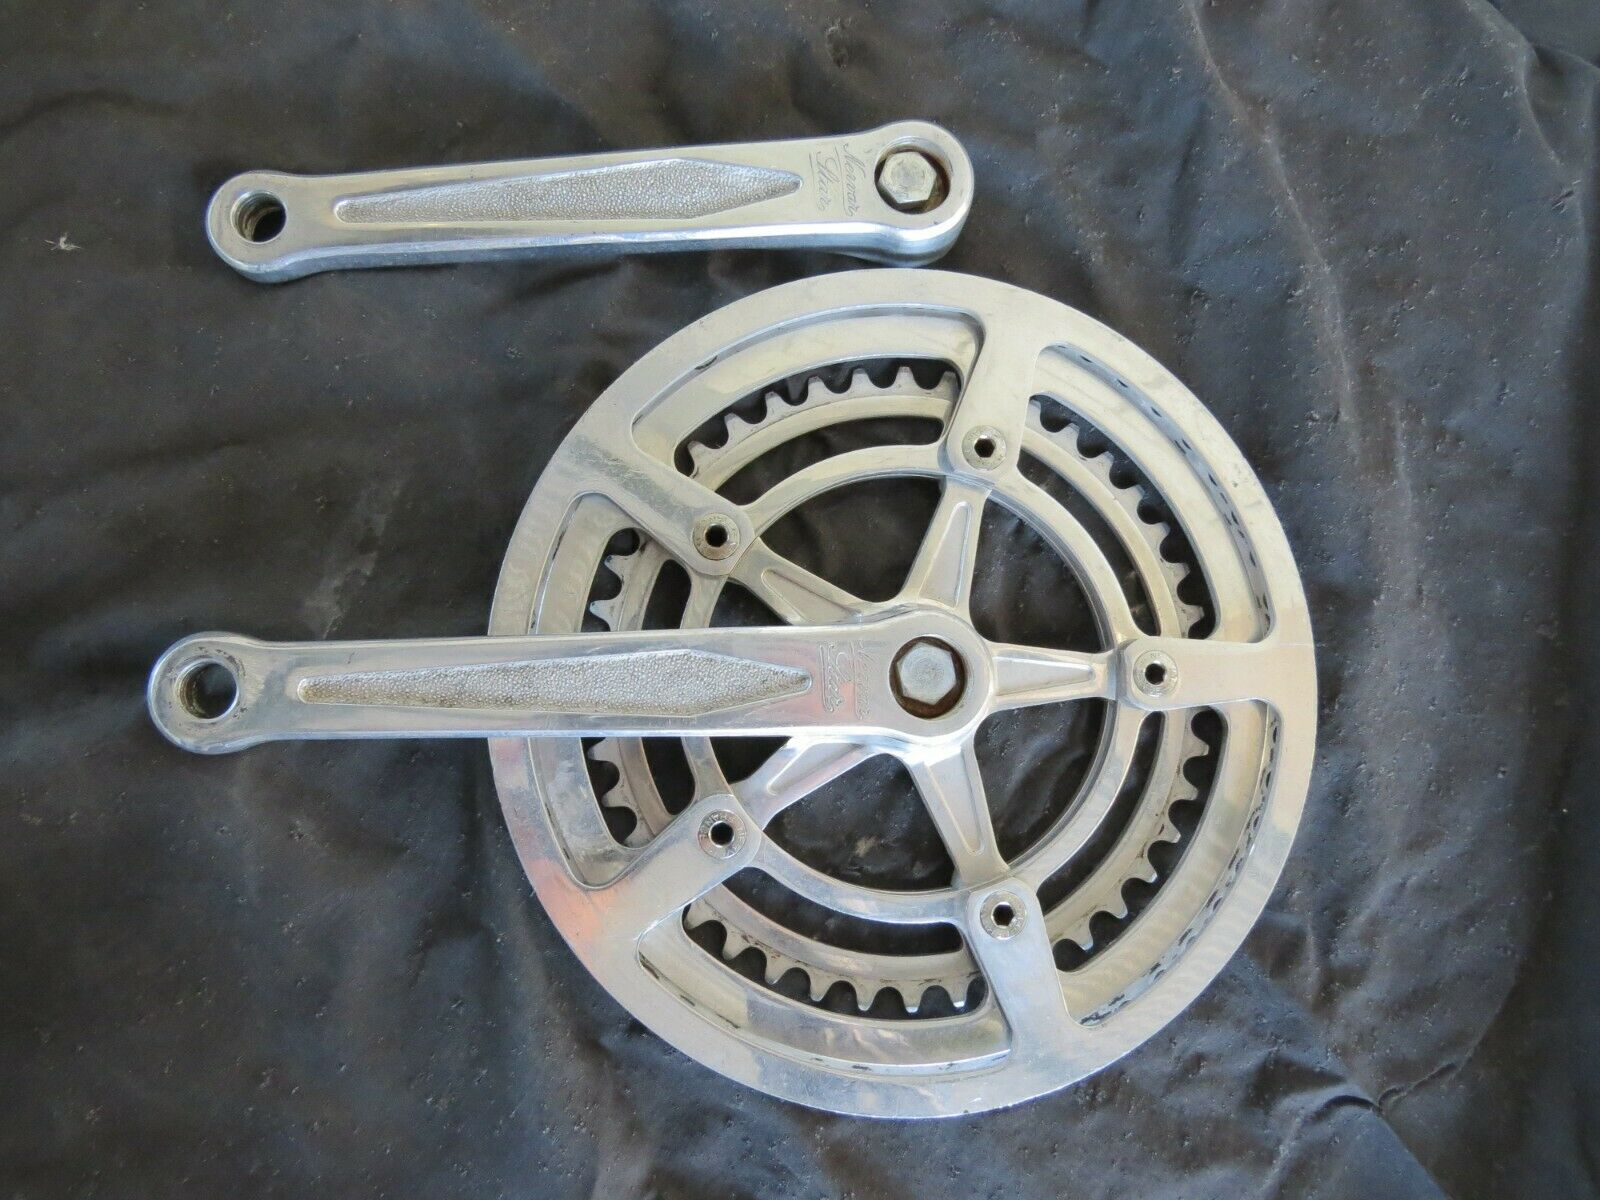 NERVAR 170 CRANKSET ARM 42 52 CHAIN RINGS WHEELS ROAD  VINTAGE BICYCLE  cheap